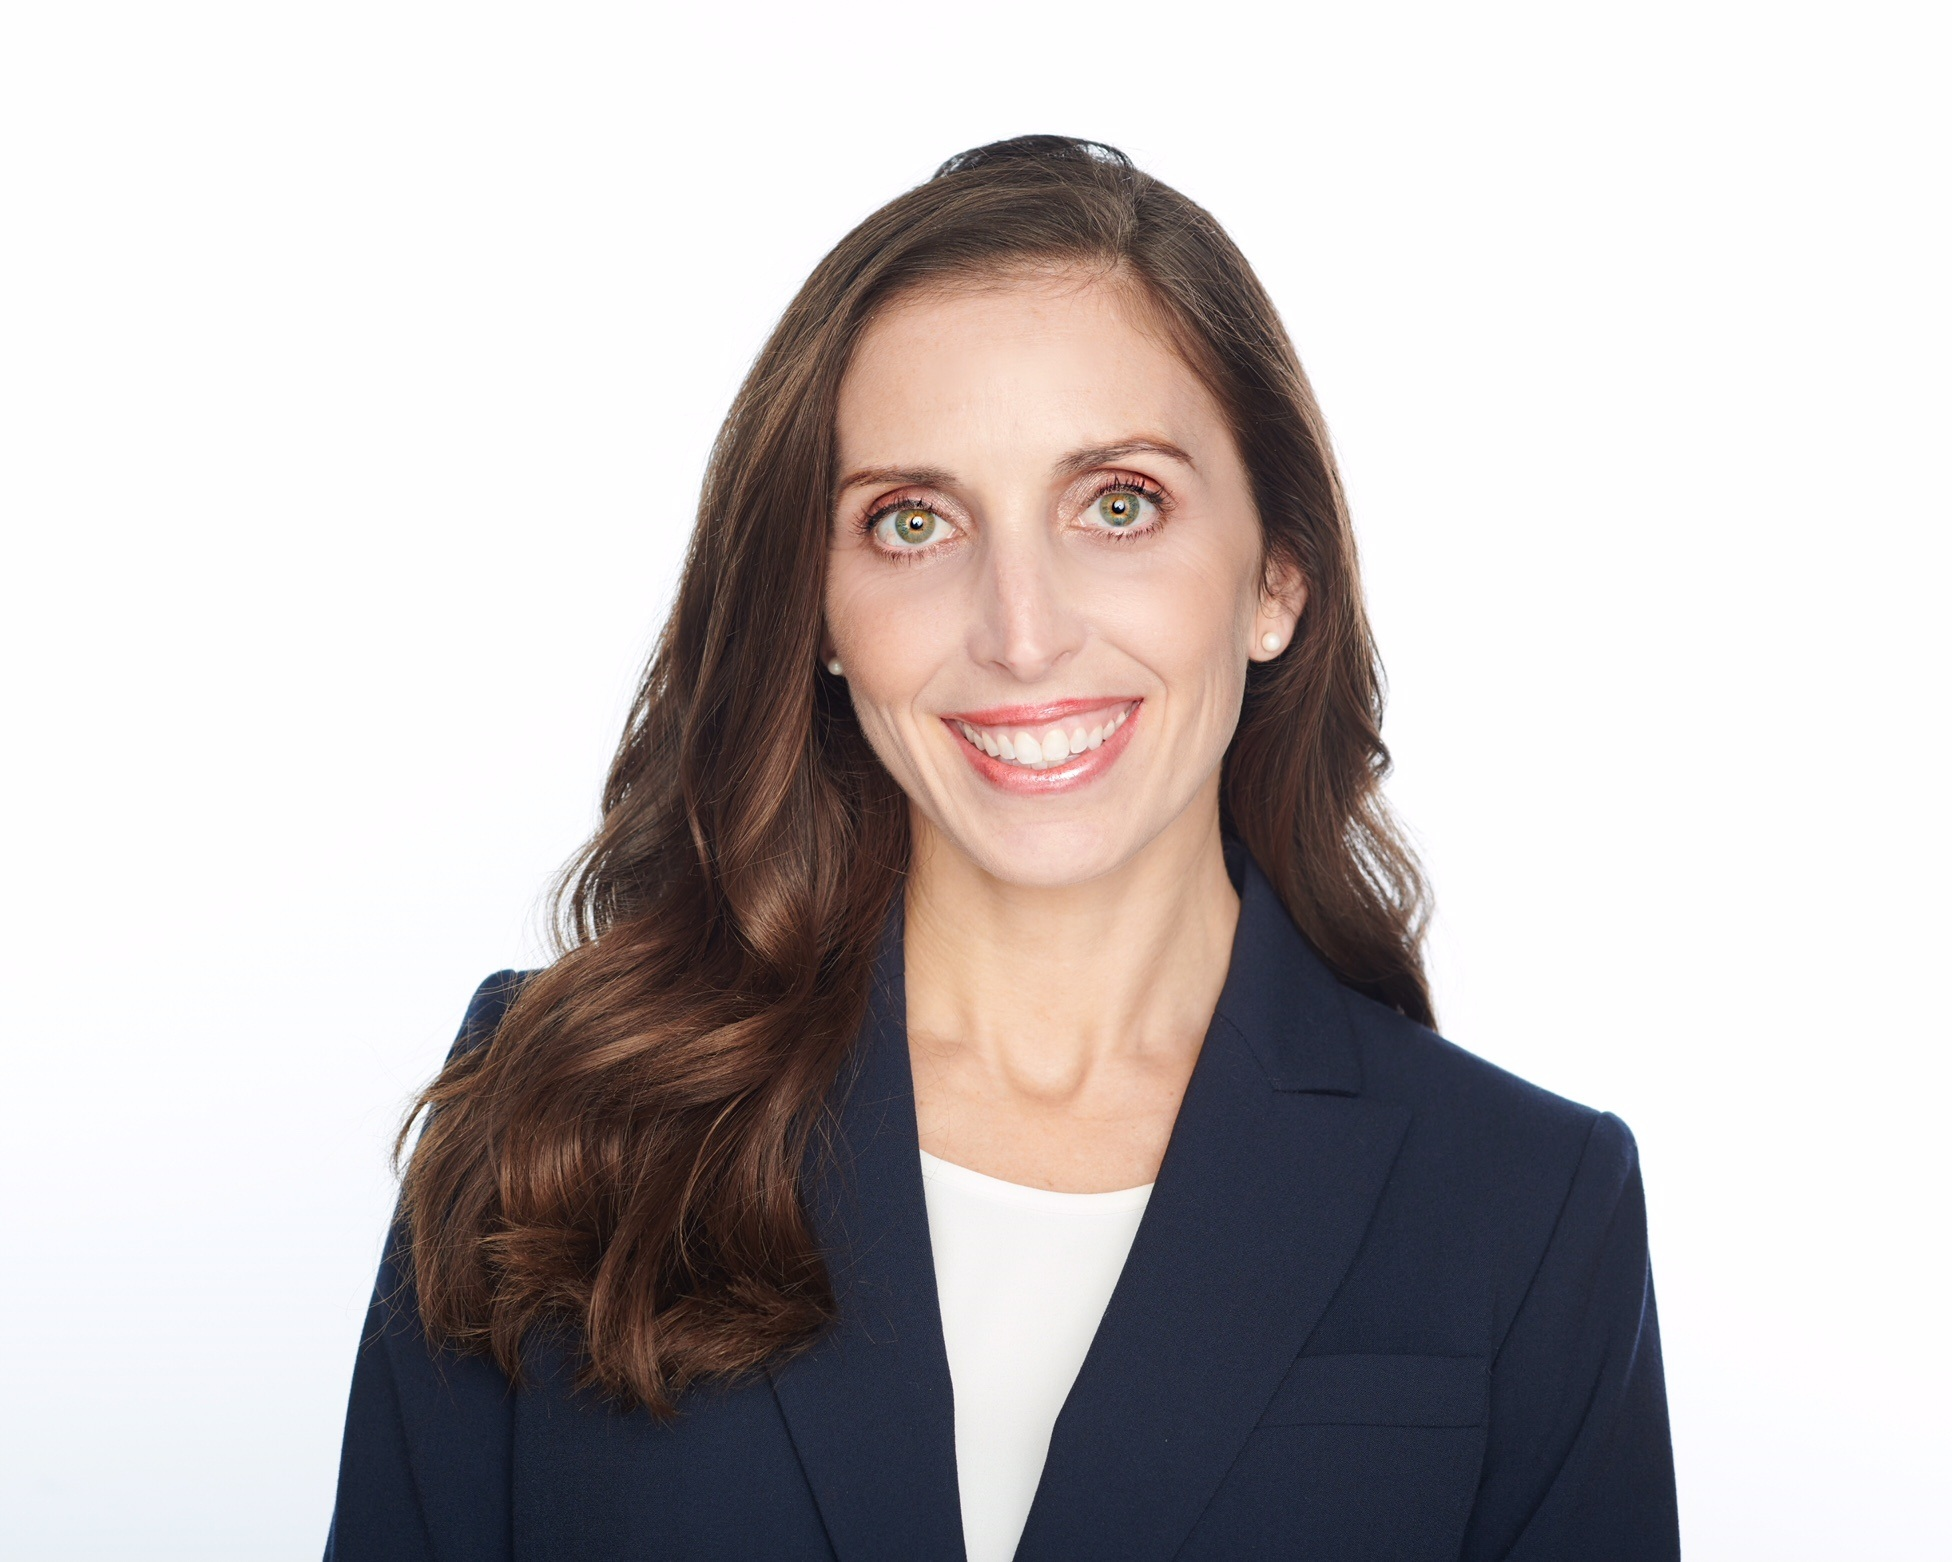 Courtney M. Alvarez - CMA Trademarks, LLC